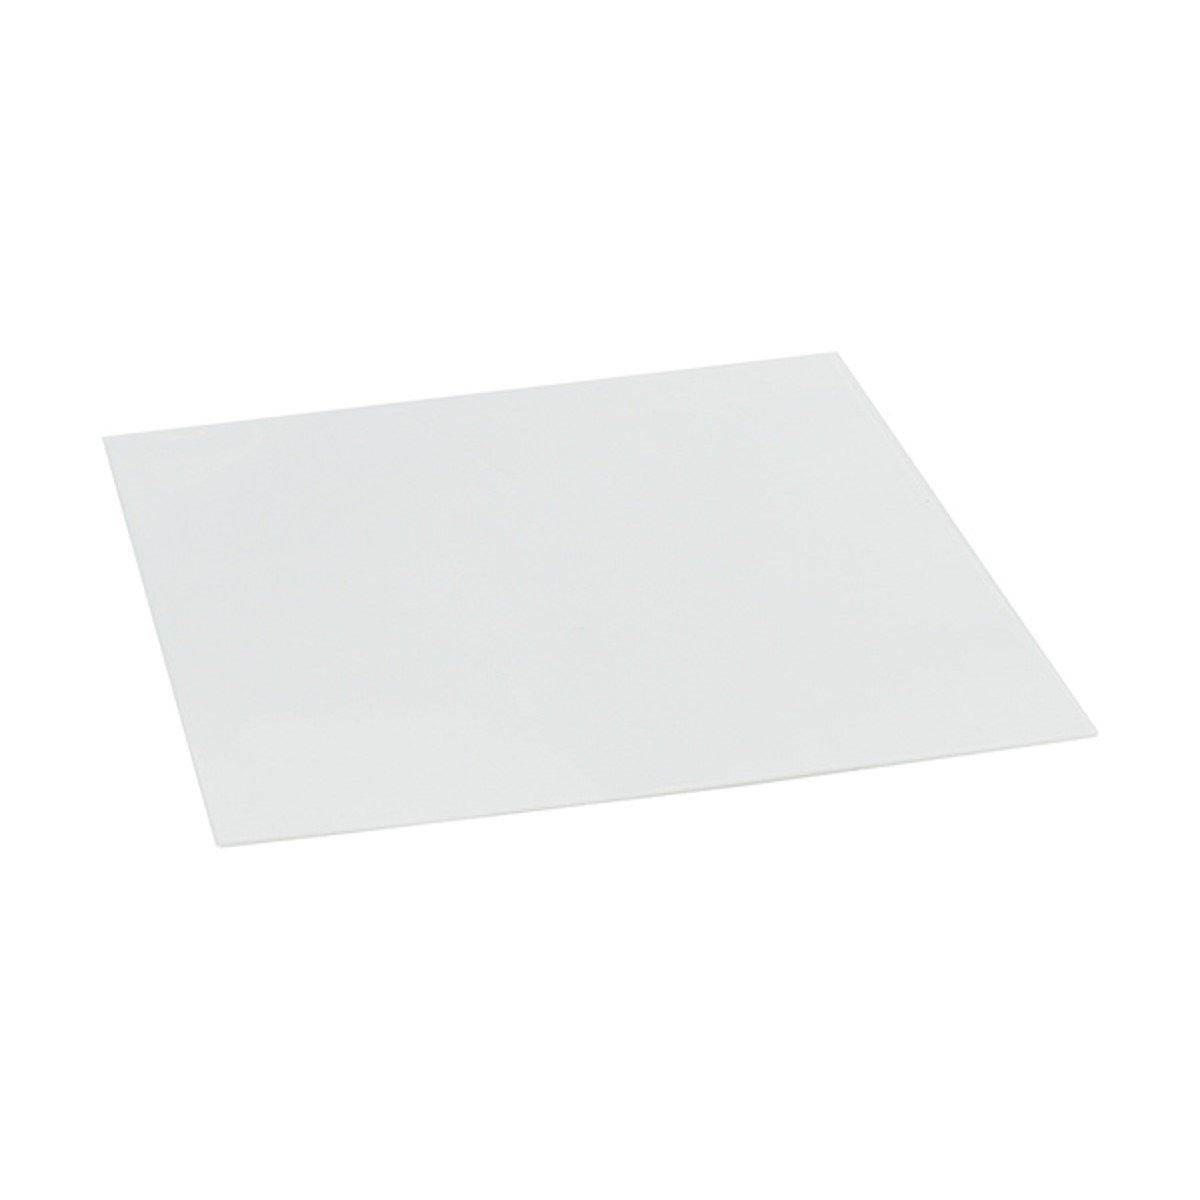 Pad Termico Phobya XT 7W/mk 100x100x0.5mm